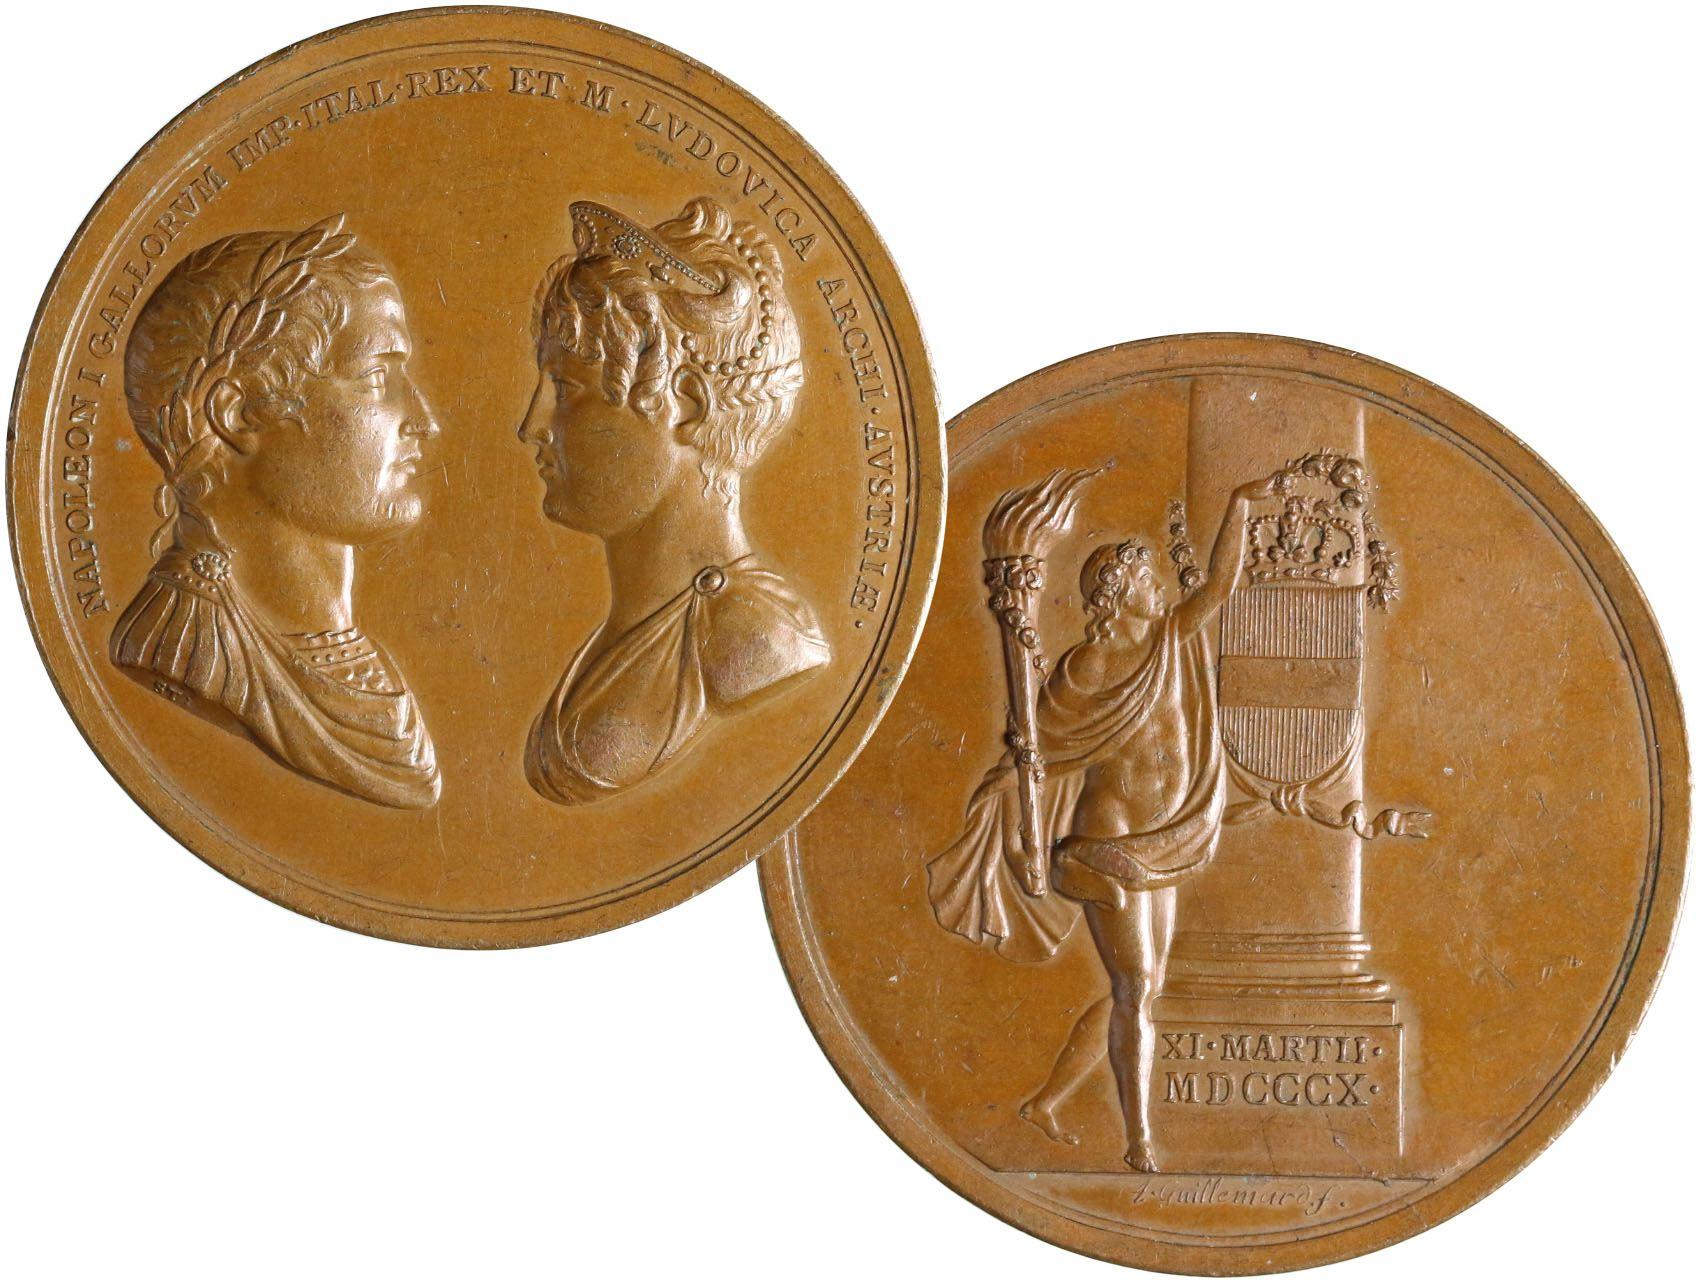 Osobnosti - Francie, Napoleon I. 1804-1815, AE medaile 11.3.1810 na svatbu Napoleona s Marií Luisou